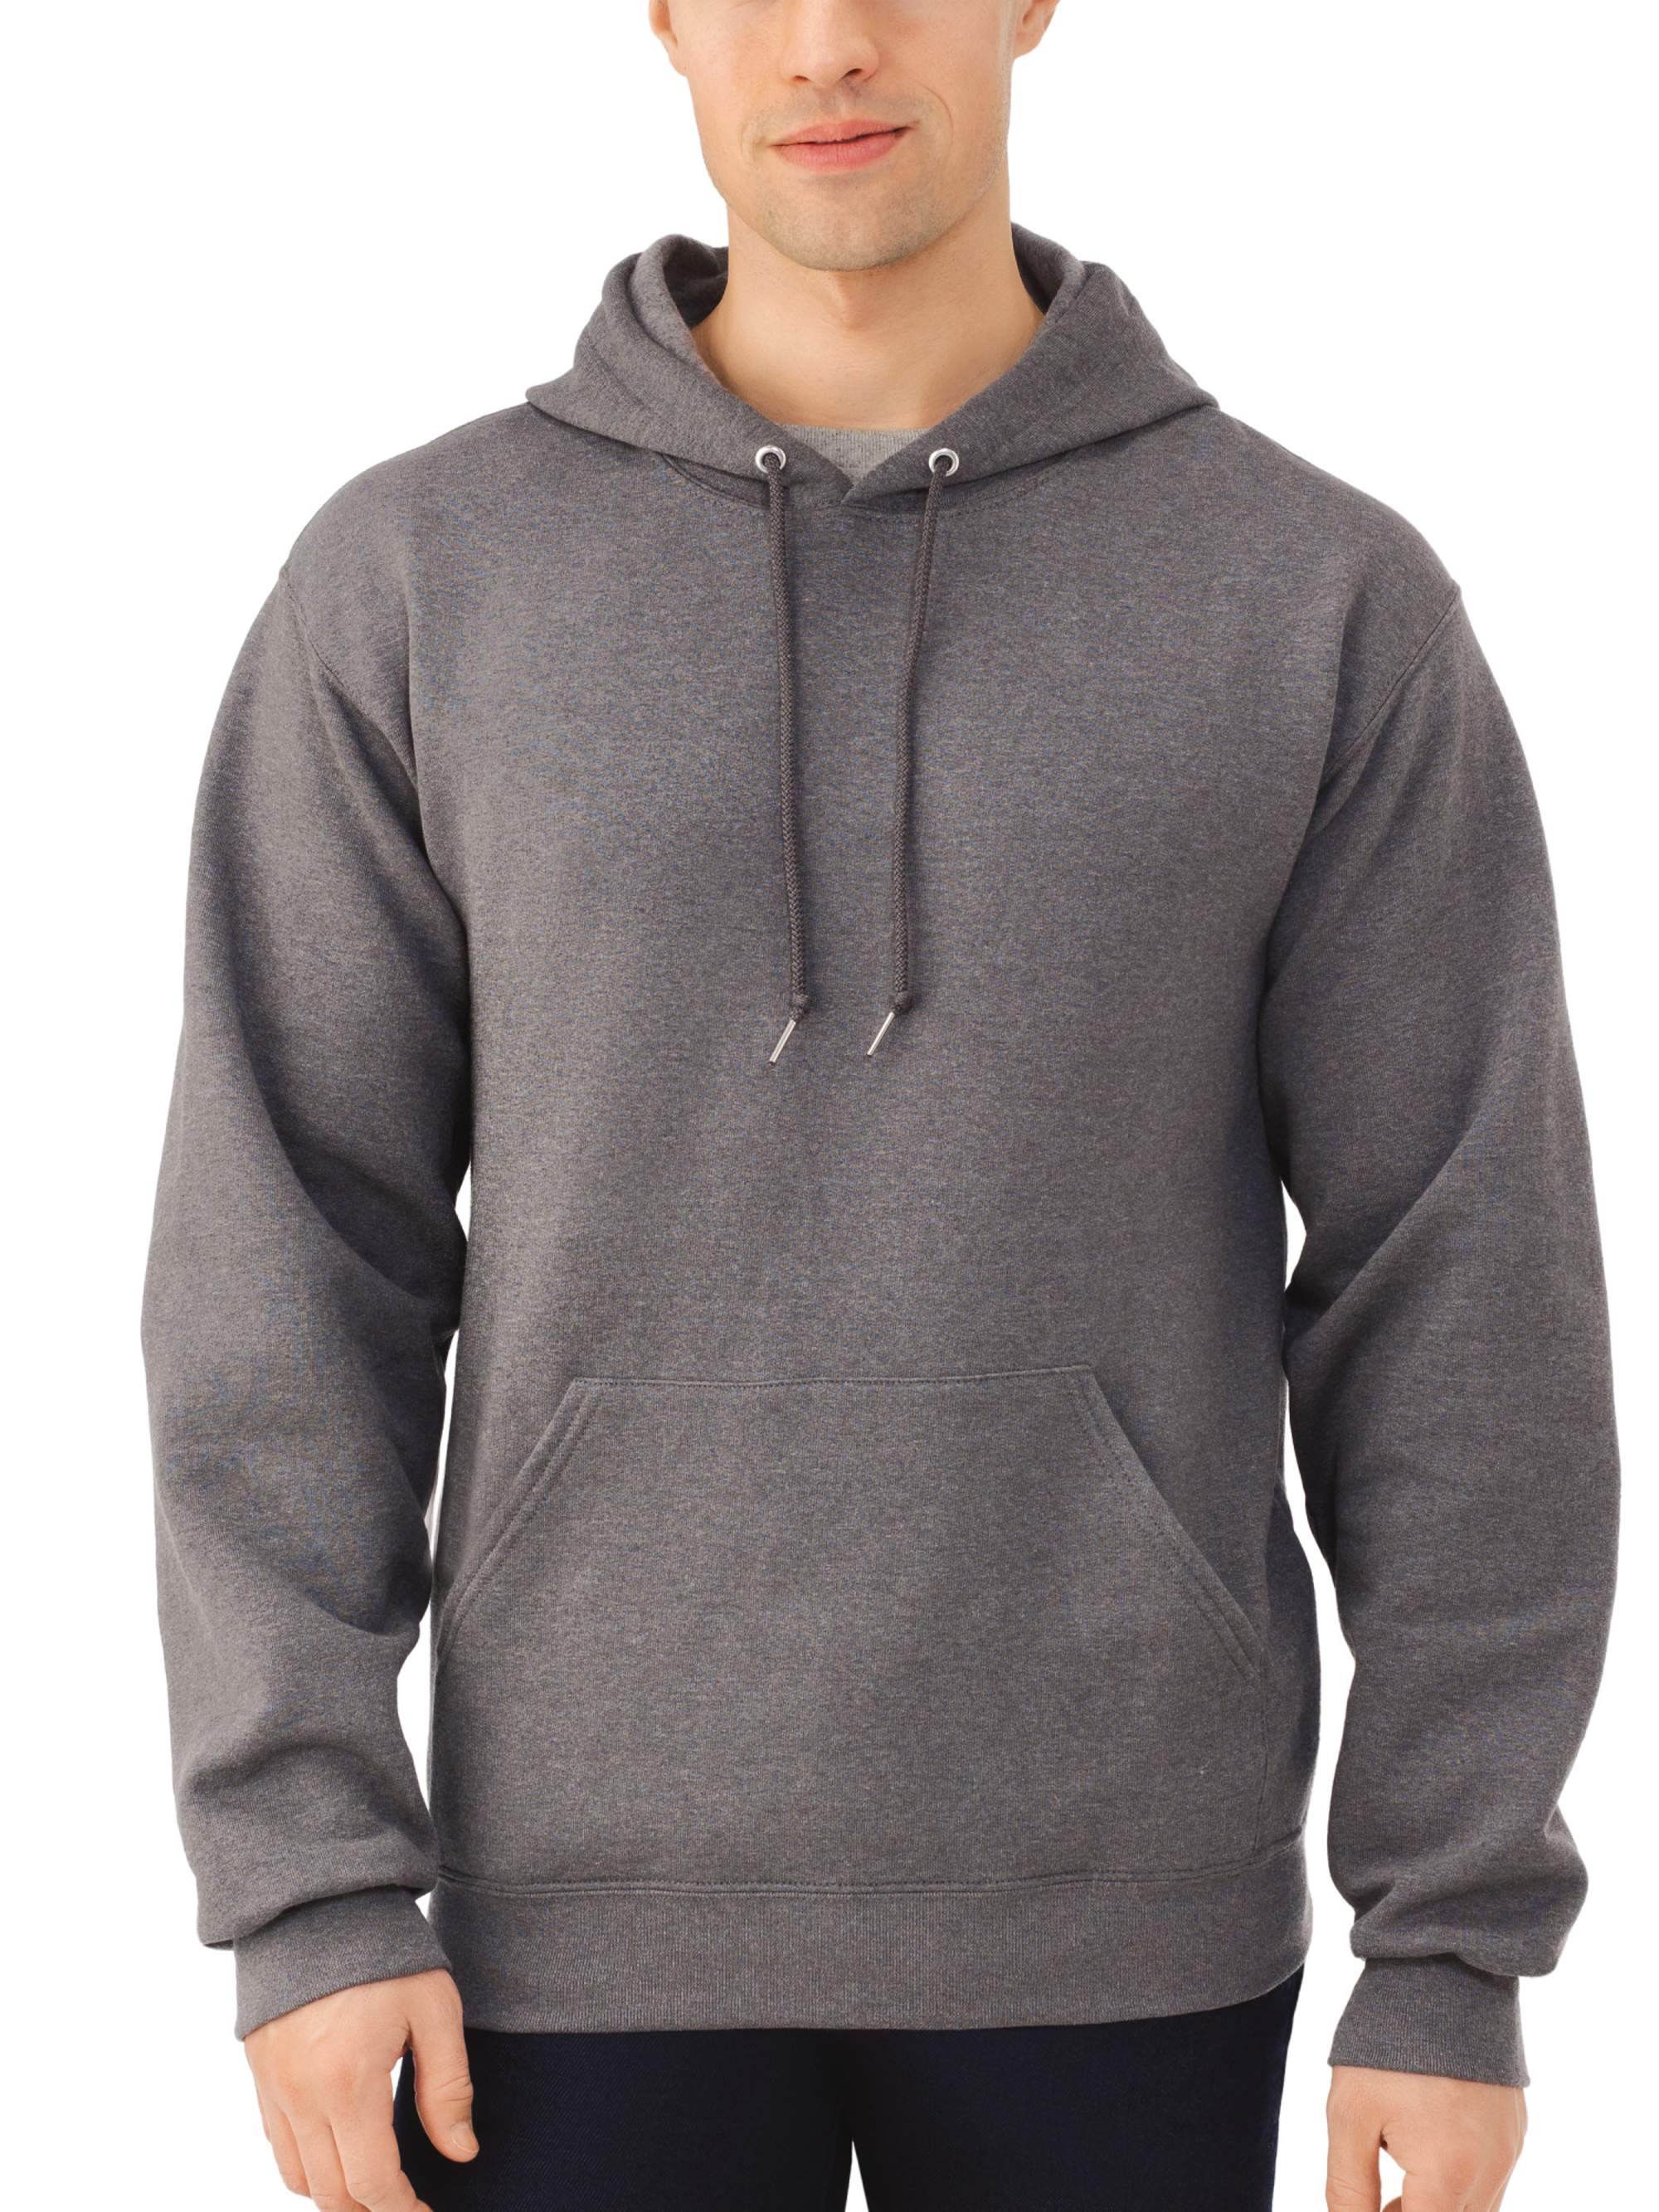 Fruit Of The Loom Mens Dual Defense Eversoft Hoodie Jumper Cotton Ml Pullover Hooded Sweatshirt